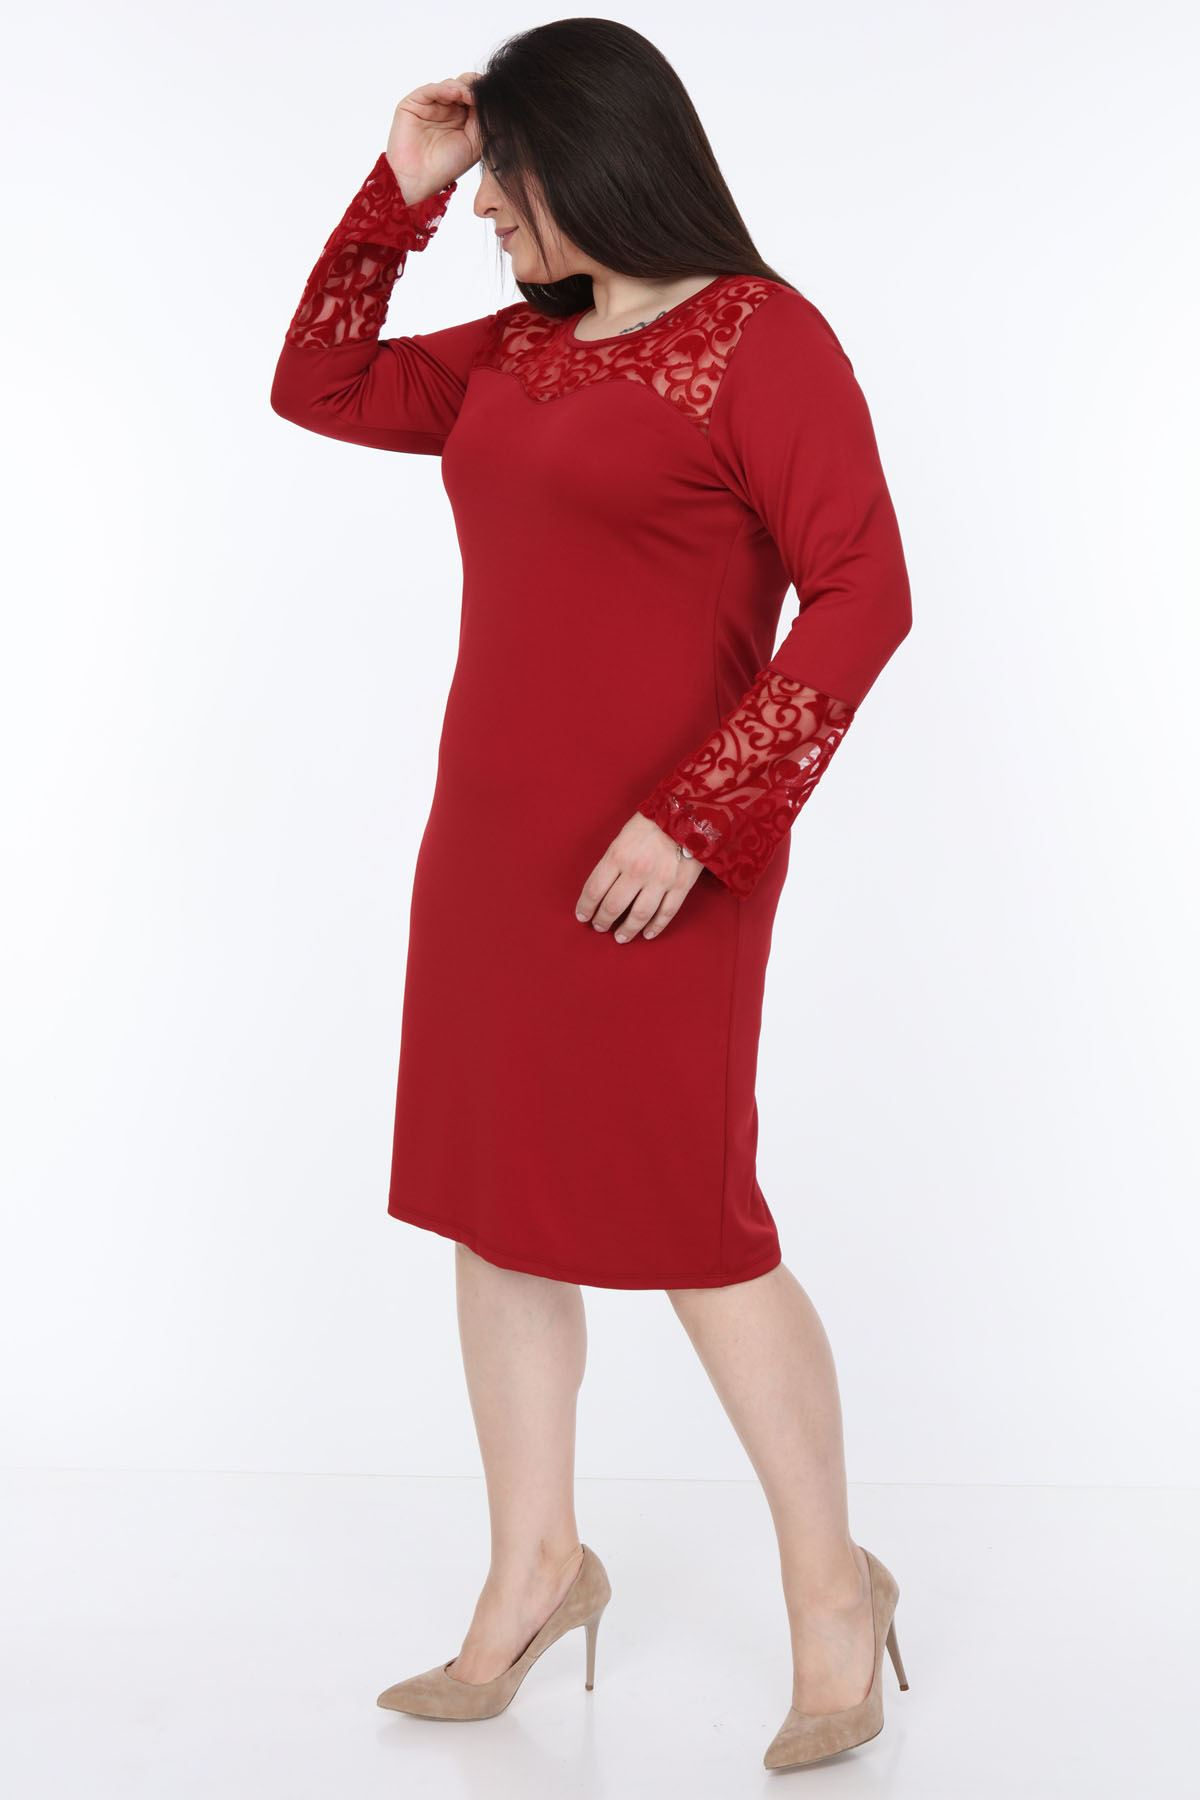 Bordo İspanyol Kol Büyük Beden Elbise 2E-1070